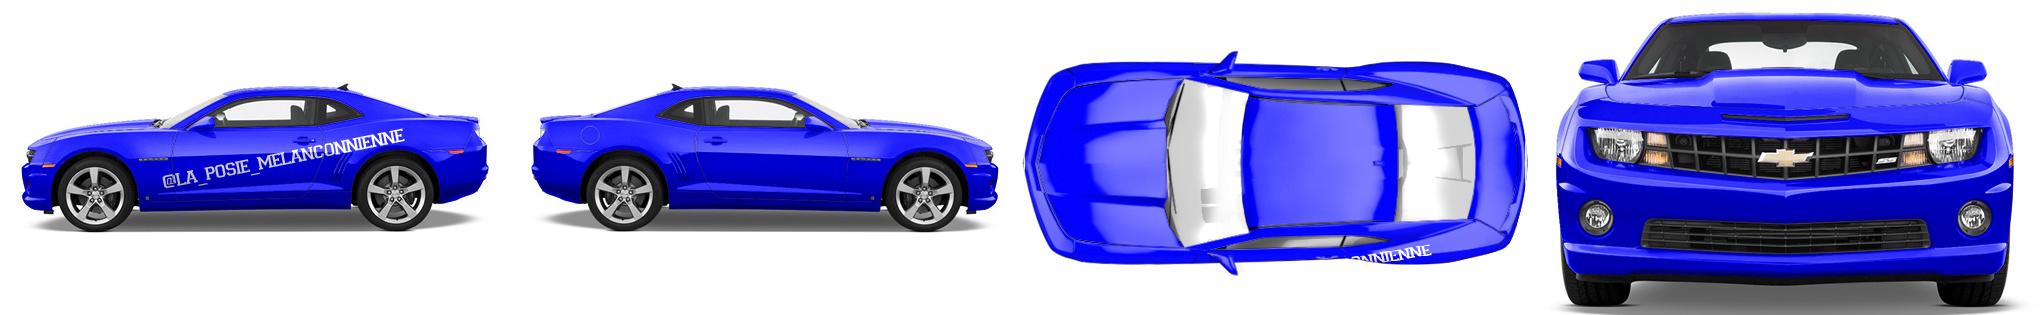 Muscle Car Wrap #51211